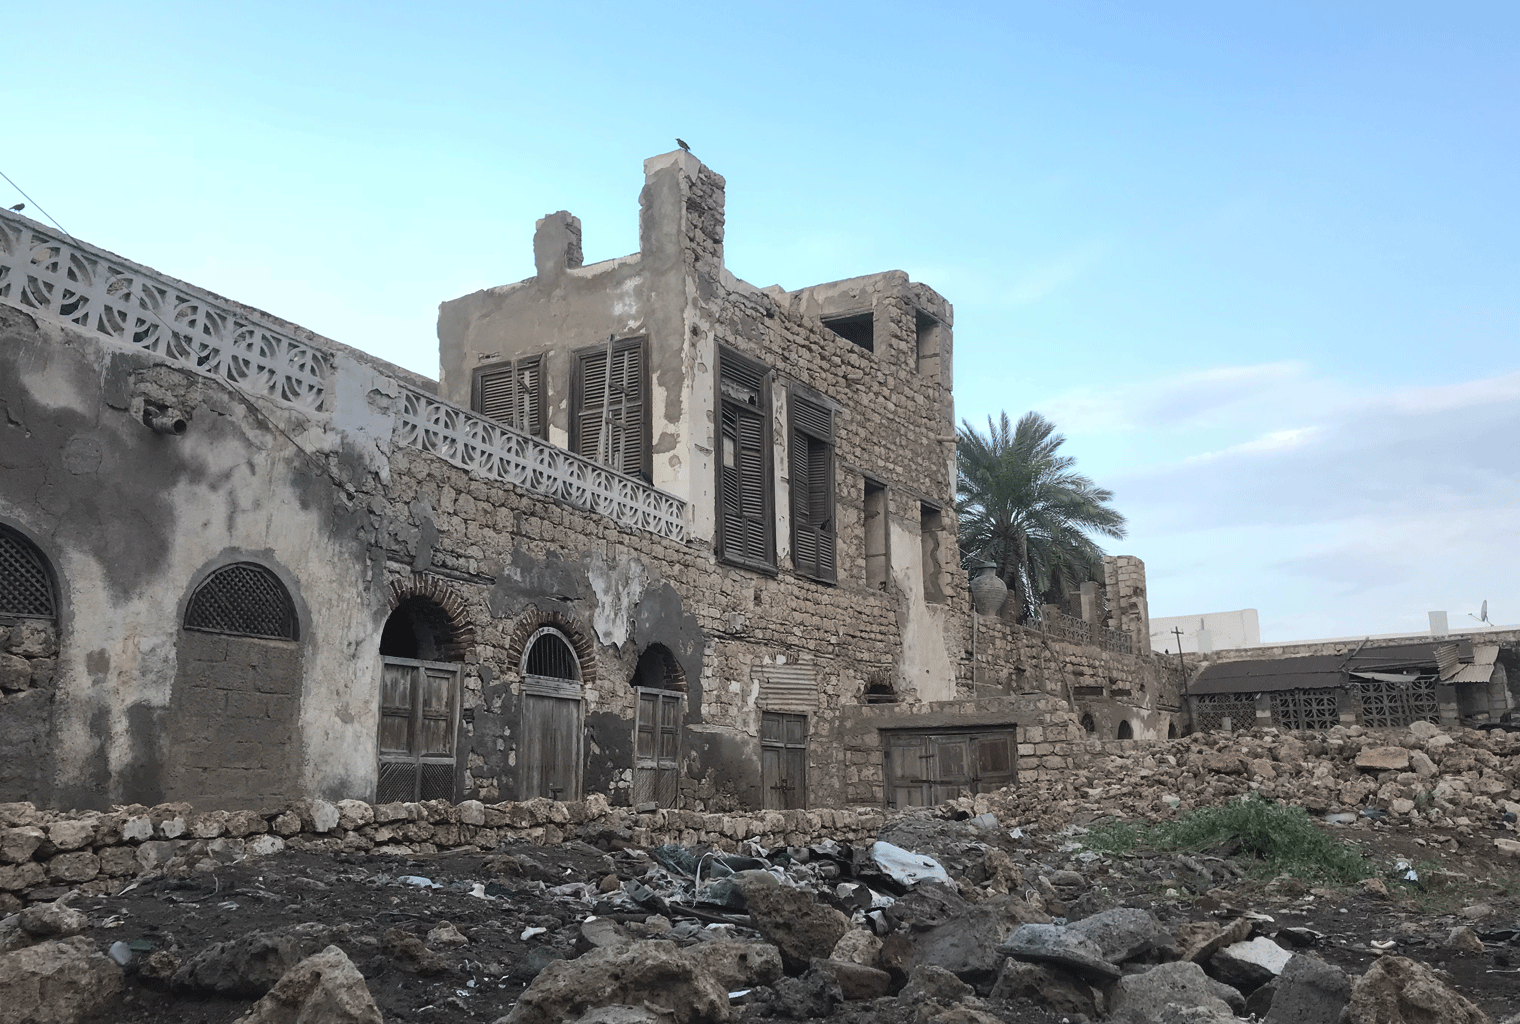 Eritrea-Massawa-Architecture-Ruins